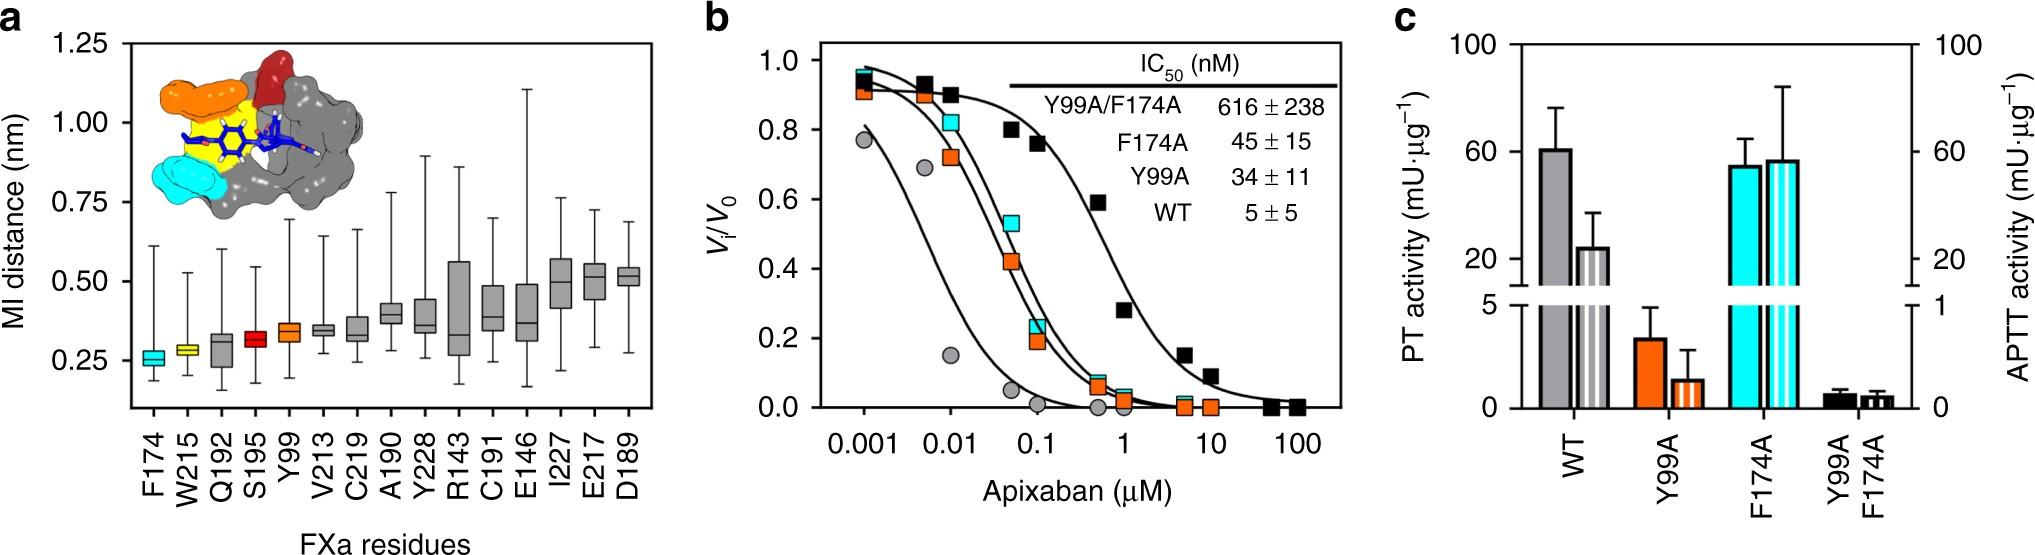 Engineered Factor Xa Variants Retain Procoagulant Activity Independent Of Direct Factor Xa Inhibitors Nature Communications